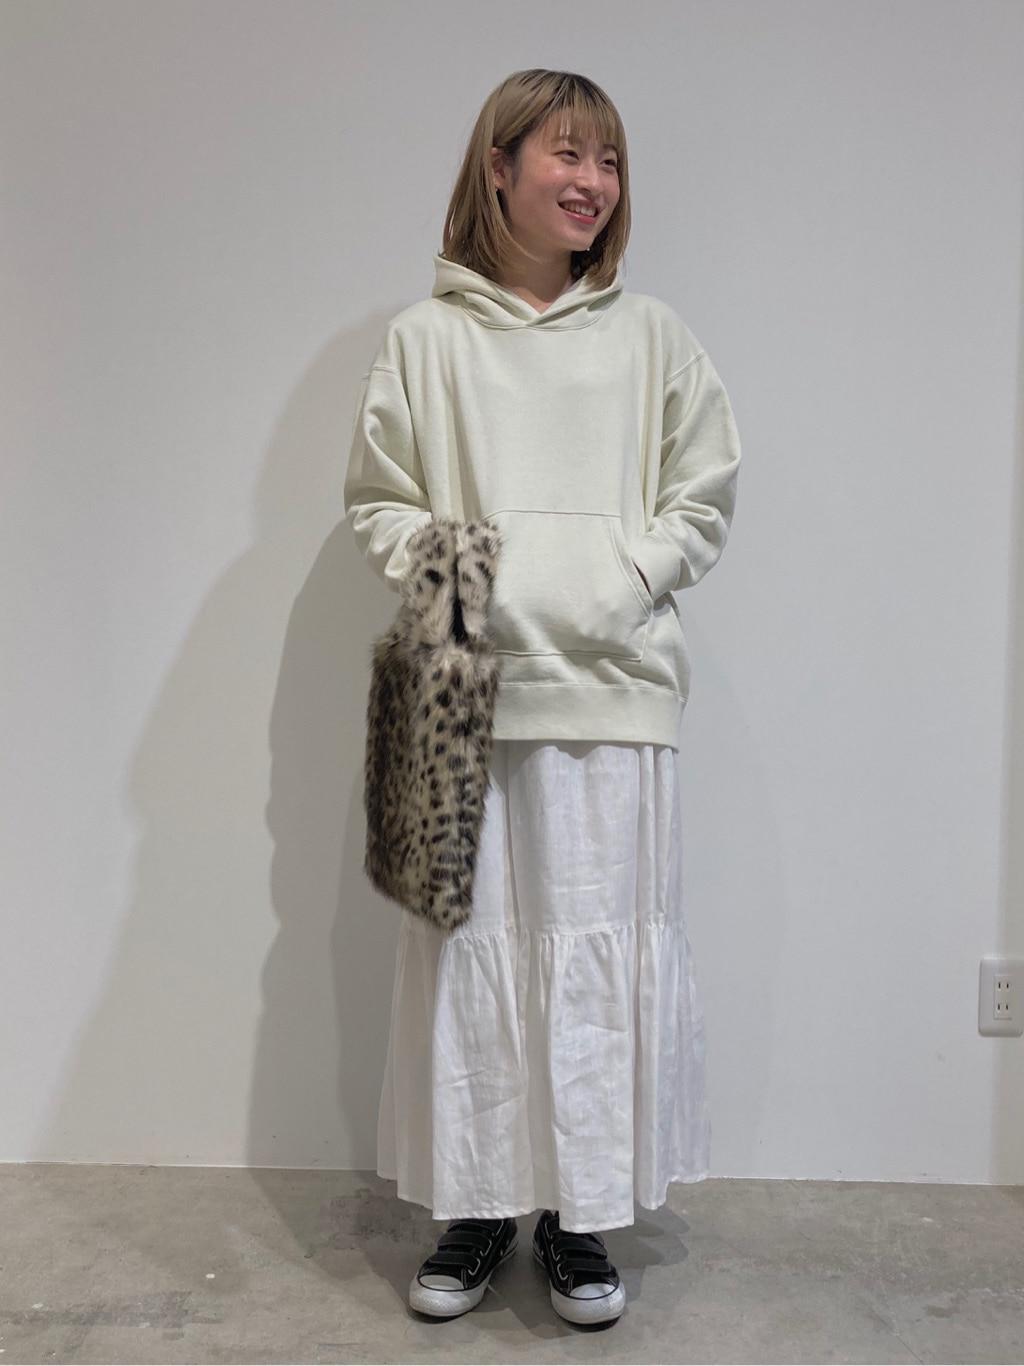 - bulle de savon FLAT AMB 名古屋栄路面 身長:162cm 2020.12.24